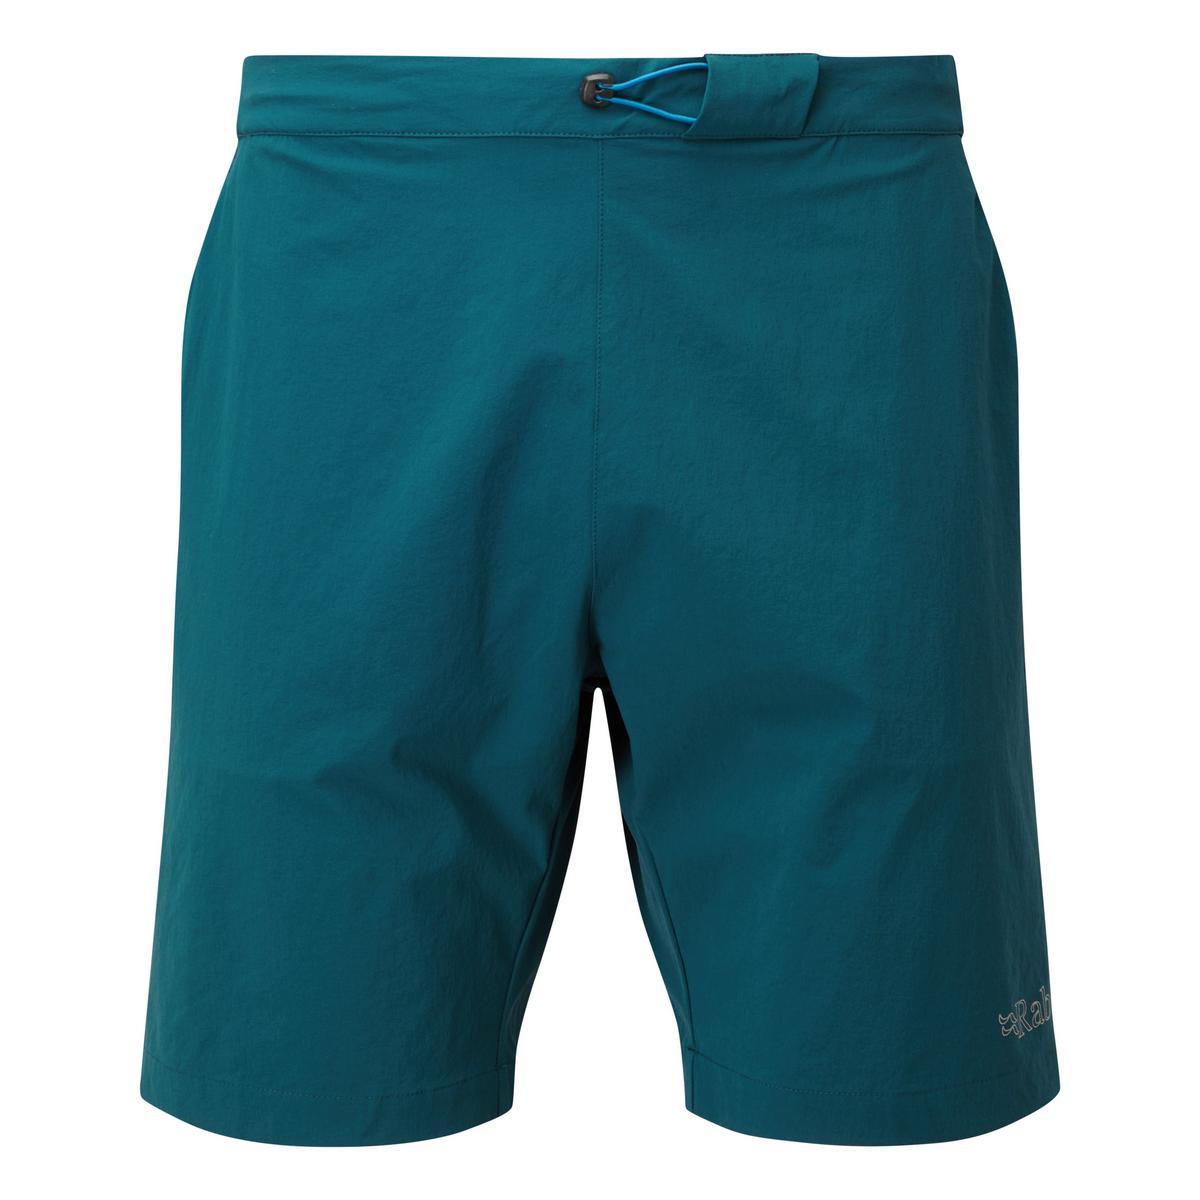 Rab Men's Momentum Shorts - Turquoise